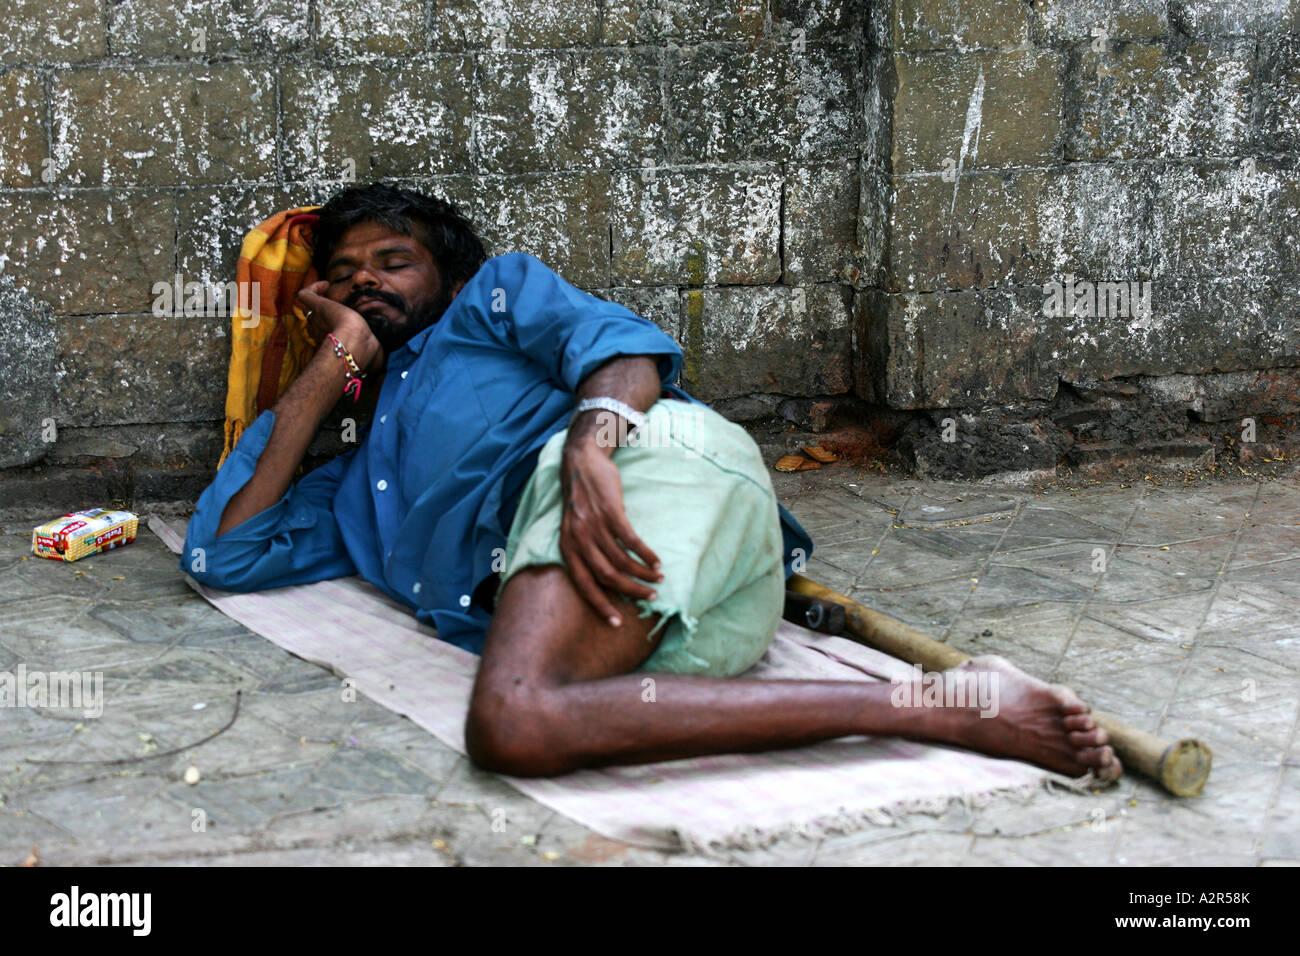 Street scenes in Mumbai India - Stock Image